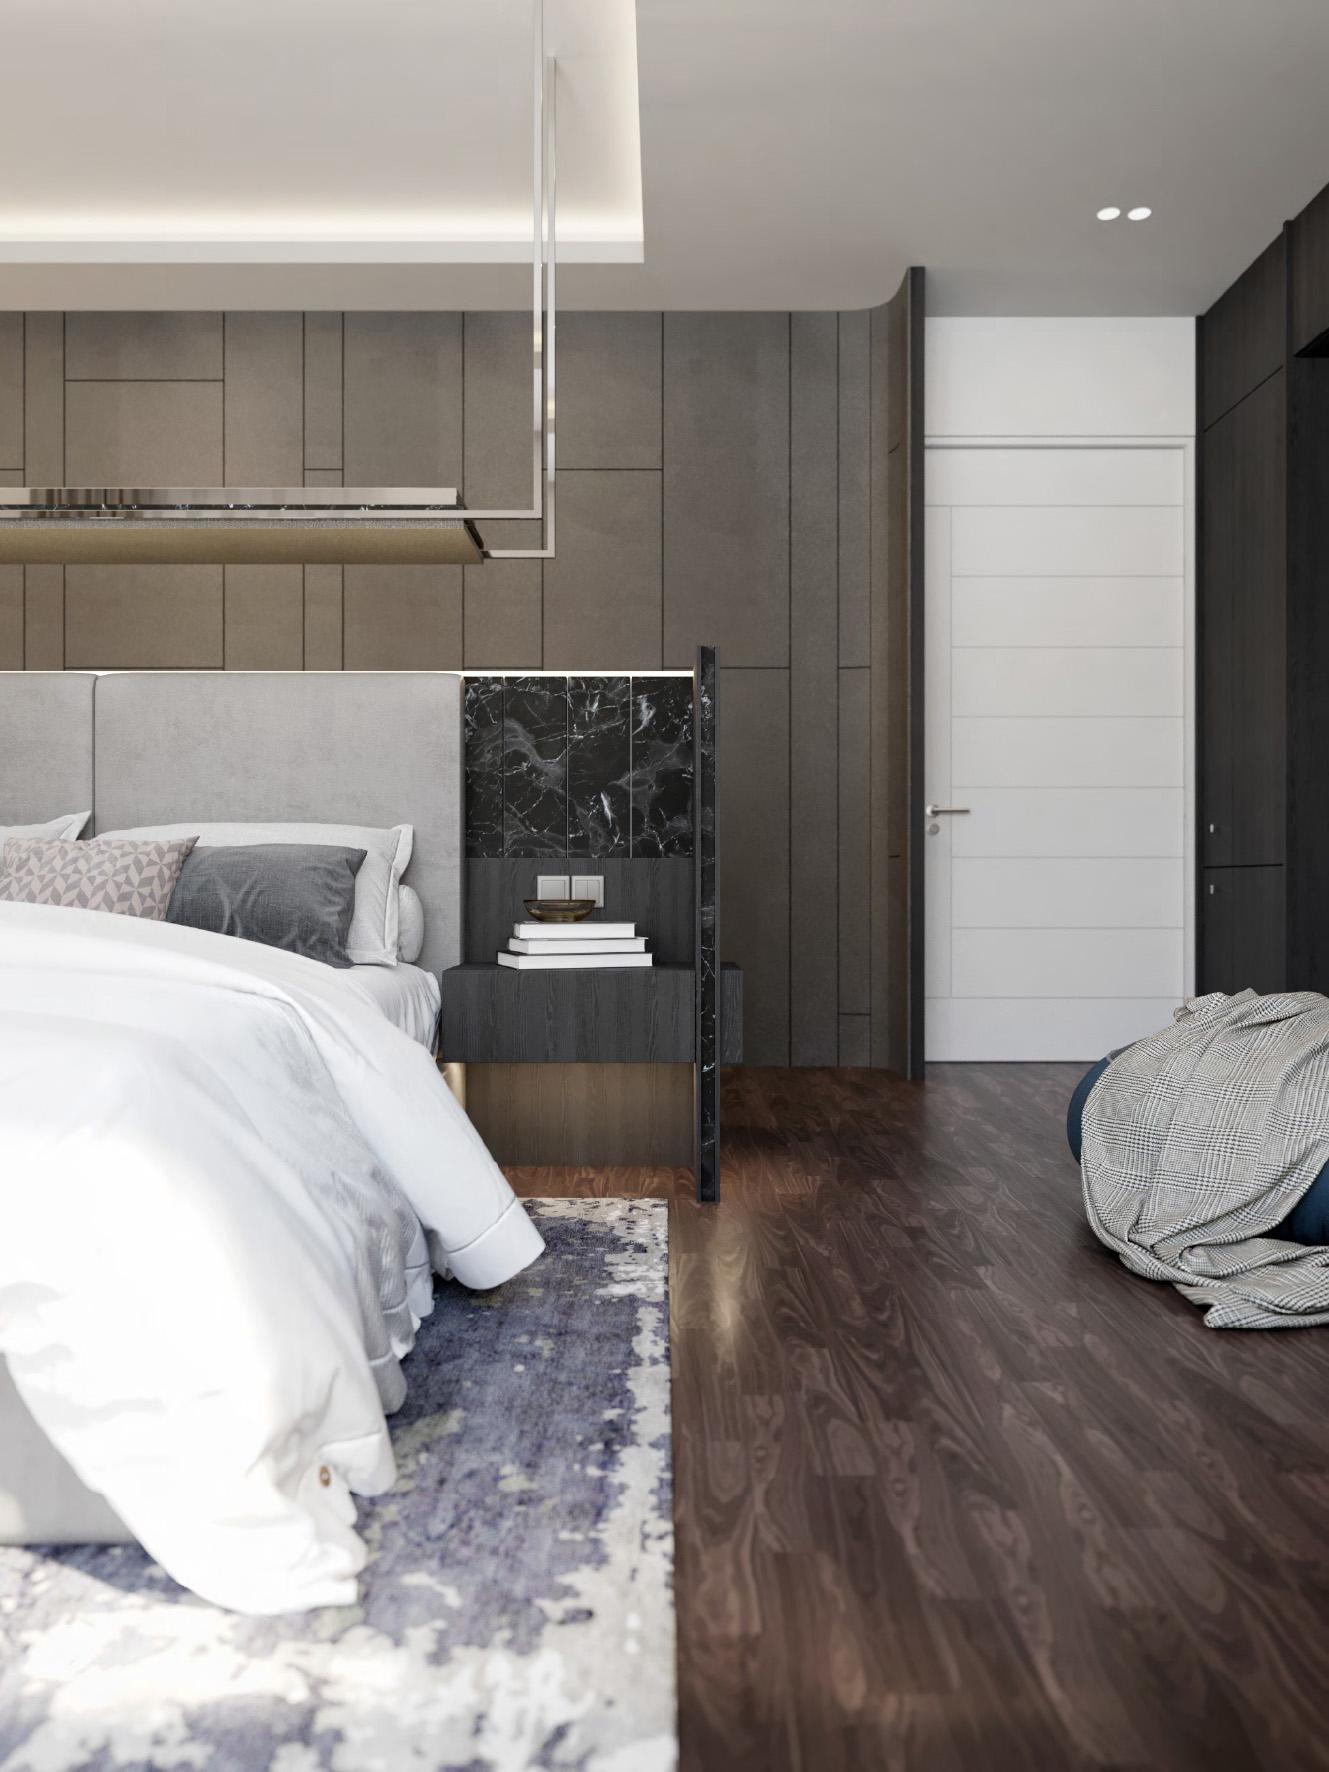 LV211 Bedroom 1